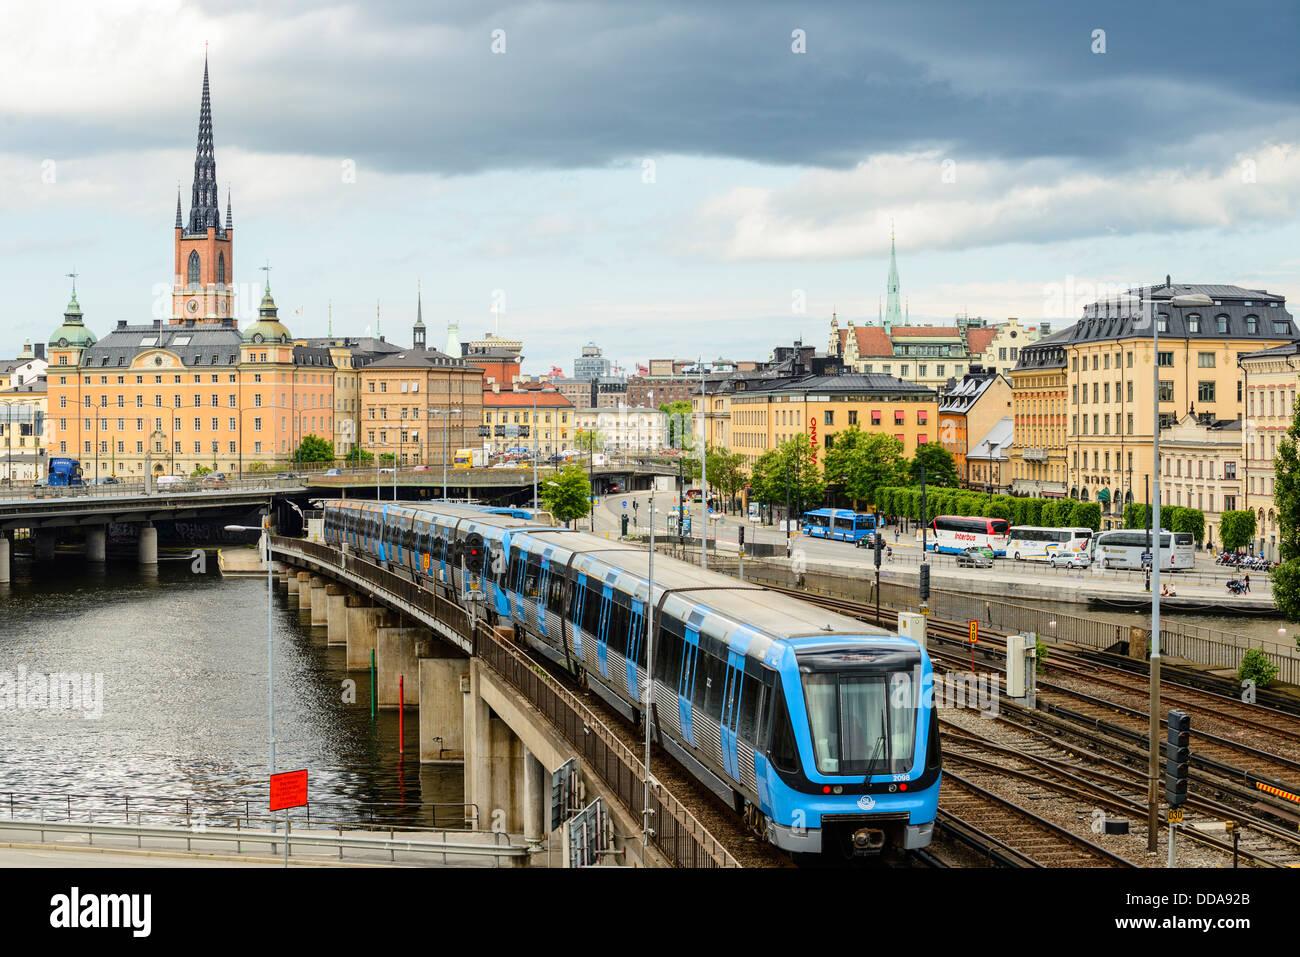 La metropolitana (T-bana) treno a Stoccolma Svezia Immagini Stock